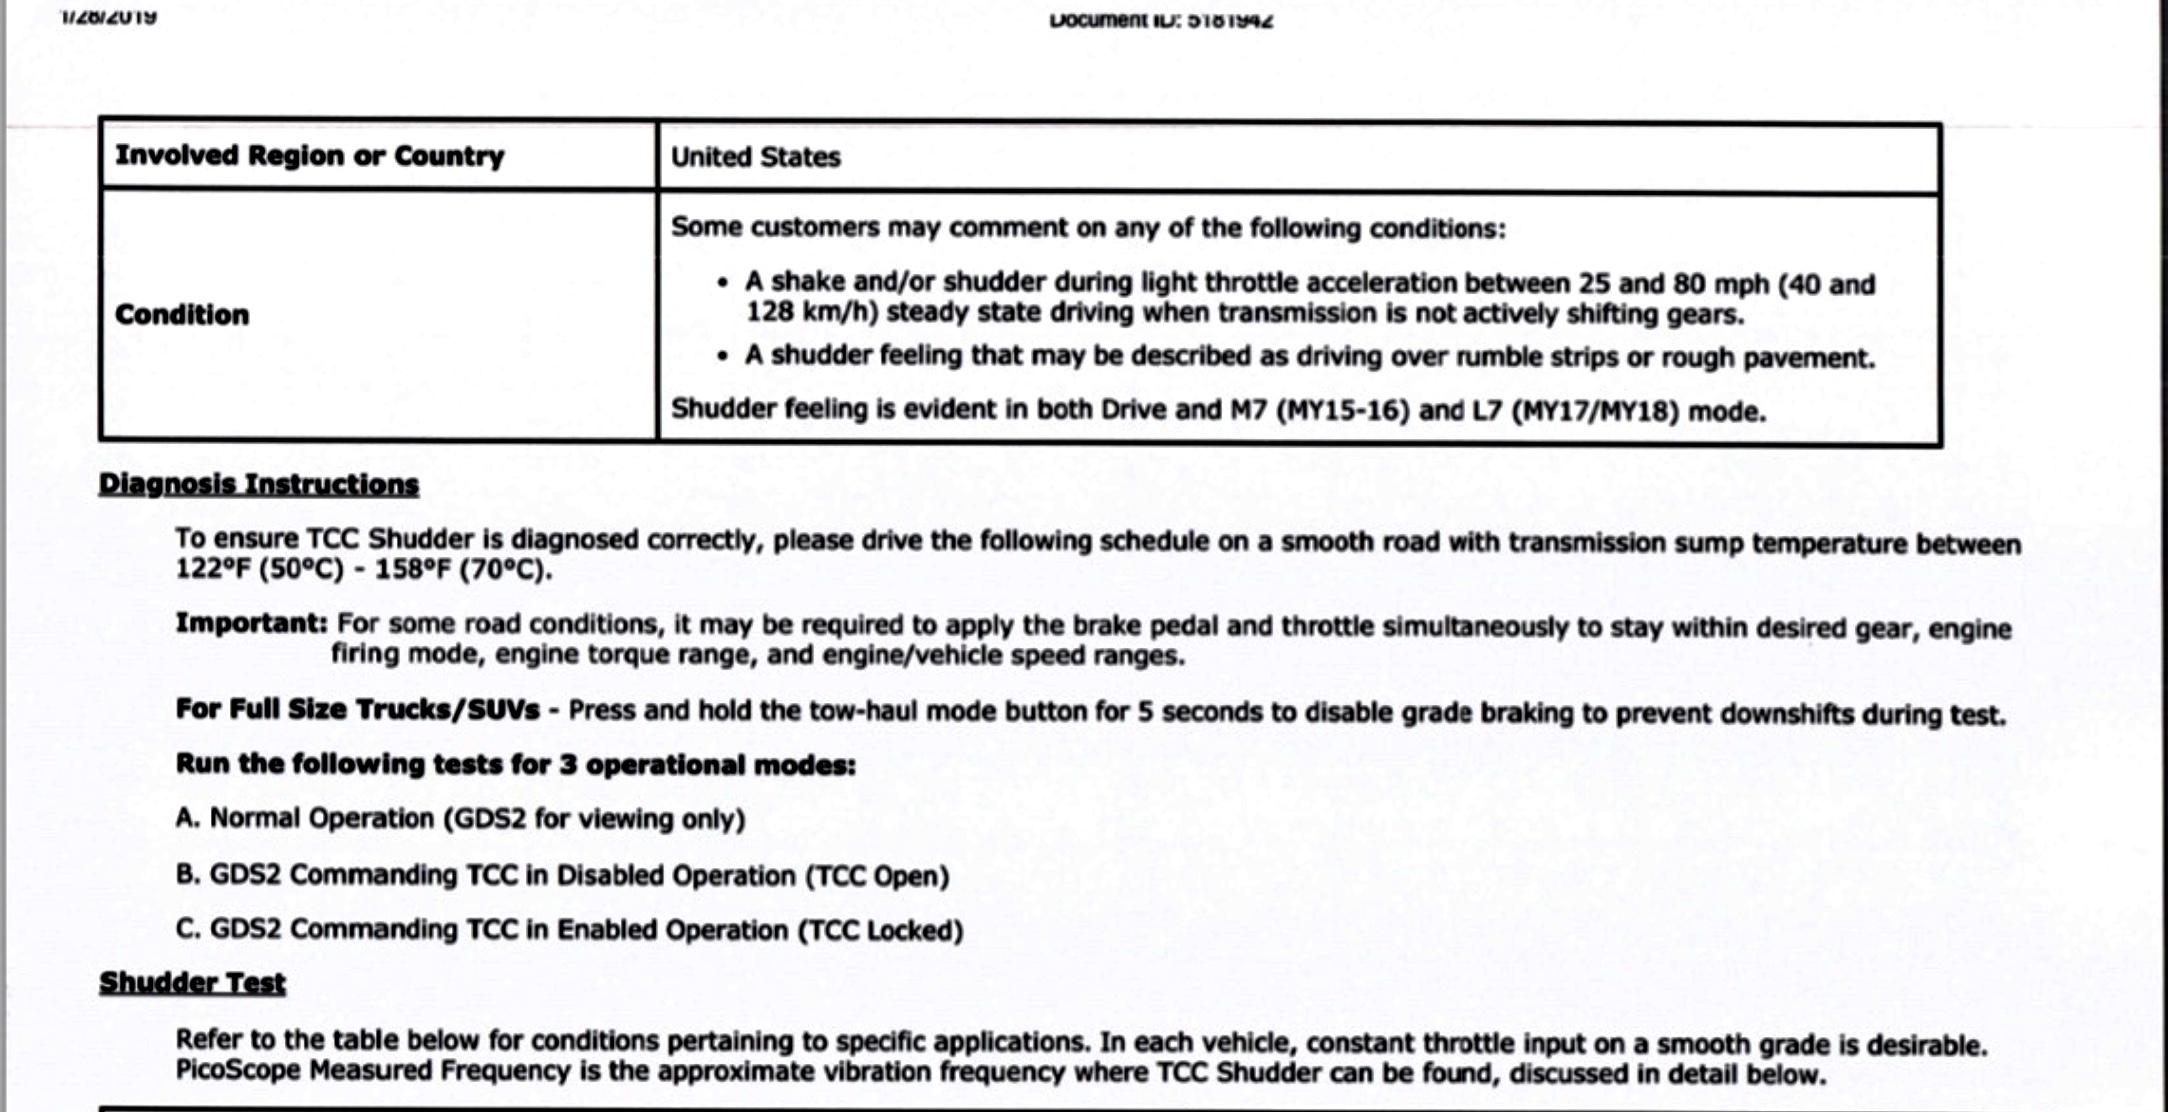 A8 Transmission Shudder Service Bulletin - MidEngineCorvetteForum com